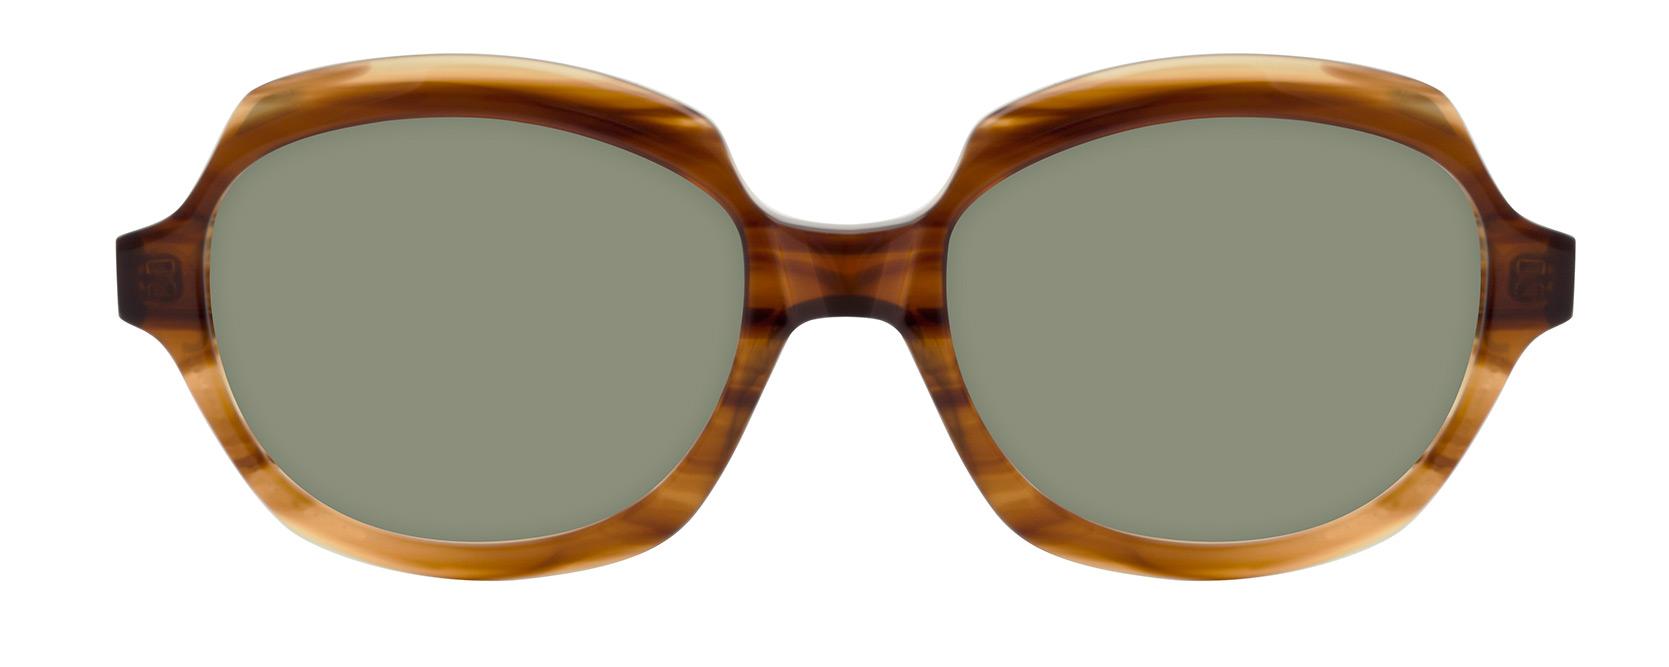 moscot-eyewear-ss2013-15